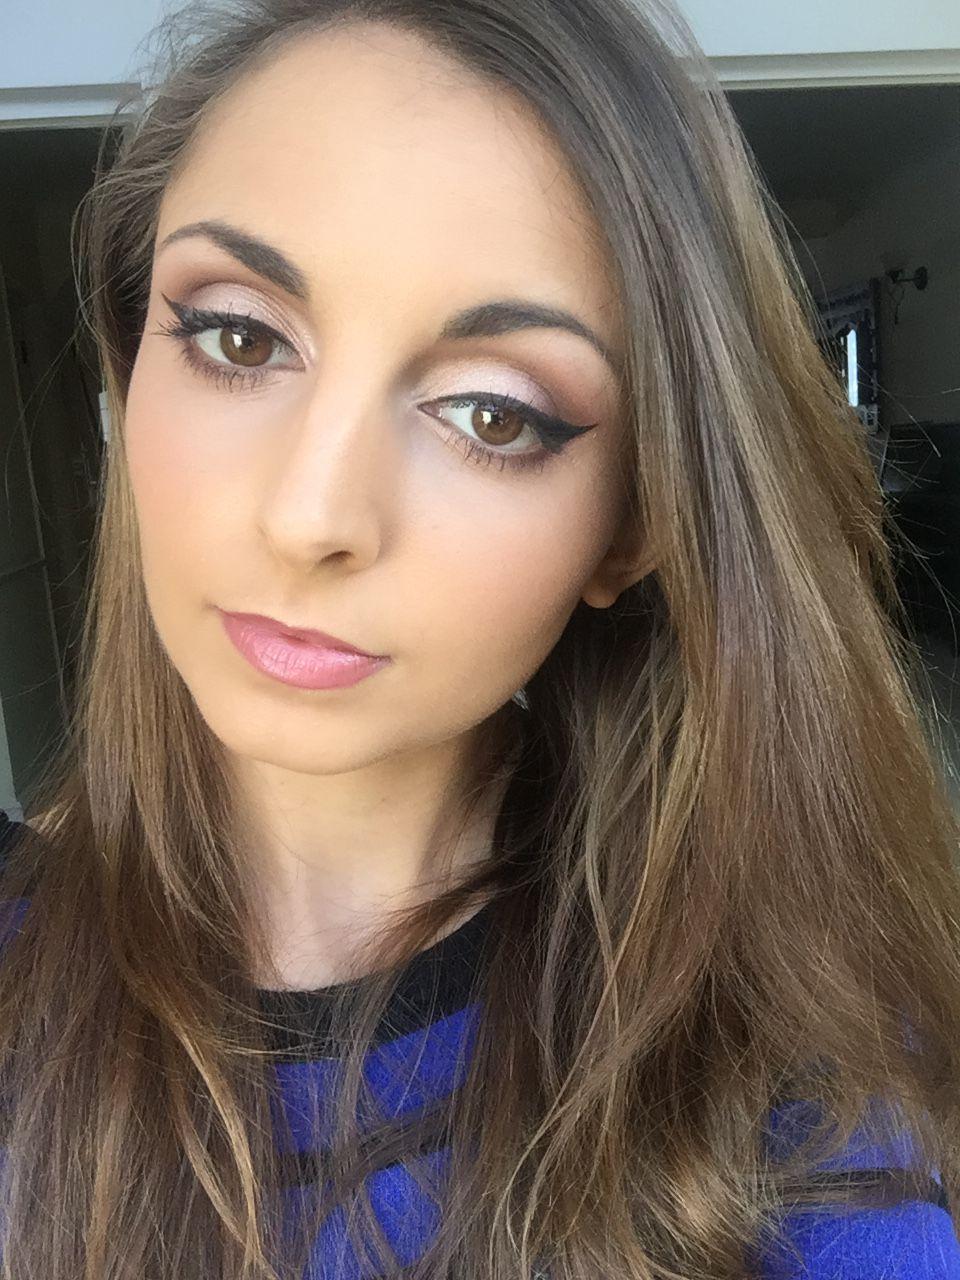 Bridal makeup using MAC eyeshadow in Swiss Chocolate (With